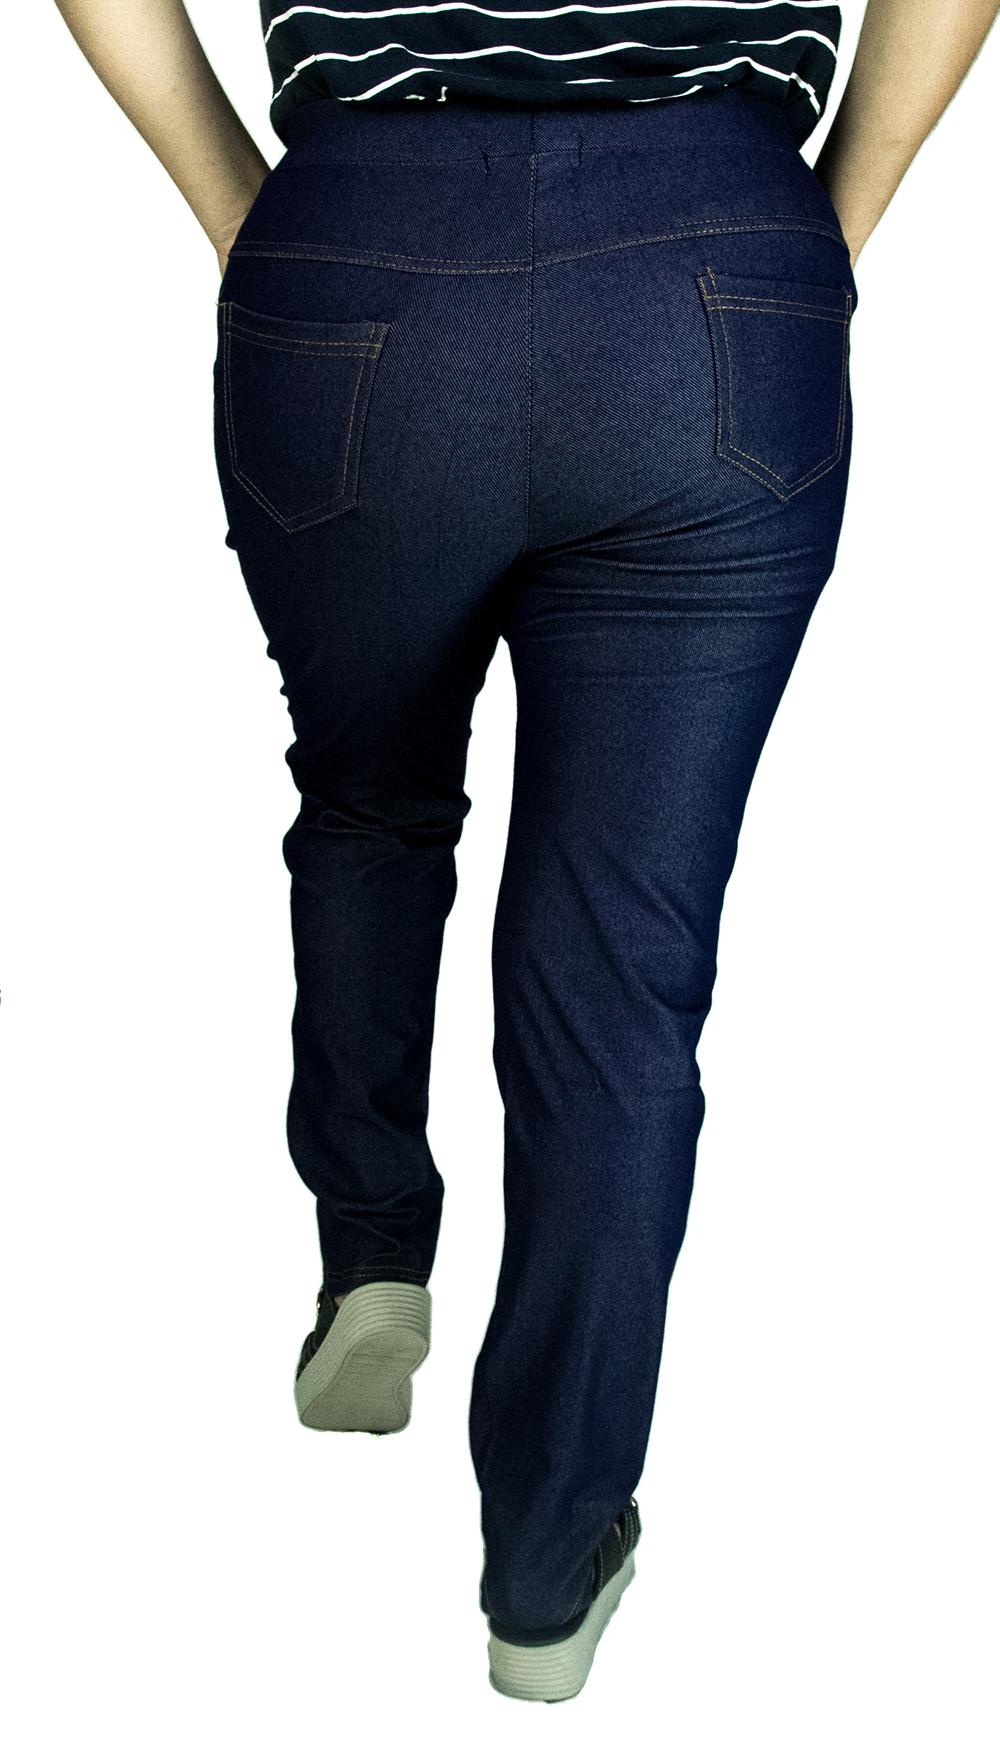 CY 3693 WOMAN CASUAL PANTS BIG PLUS SIZE SELUAR SIZE BESAR XXXL 4XL 5XL 6XL